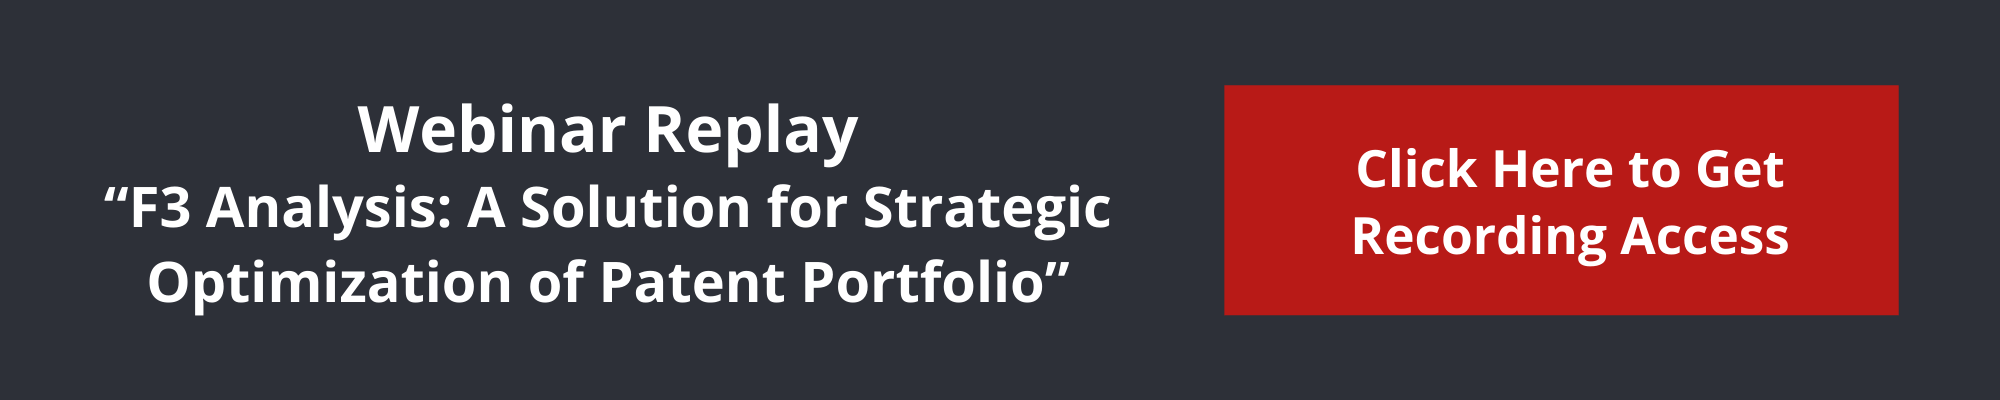 "Webinar Replay ""F3 Analysis_ A Solution for Strategic Optimization of Patent Portfolio"""